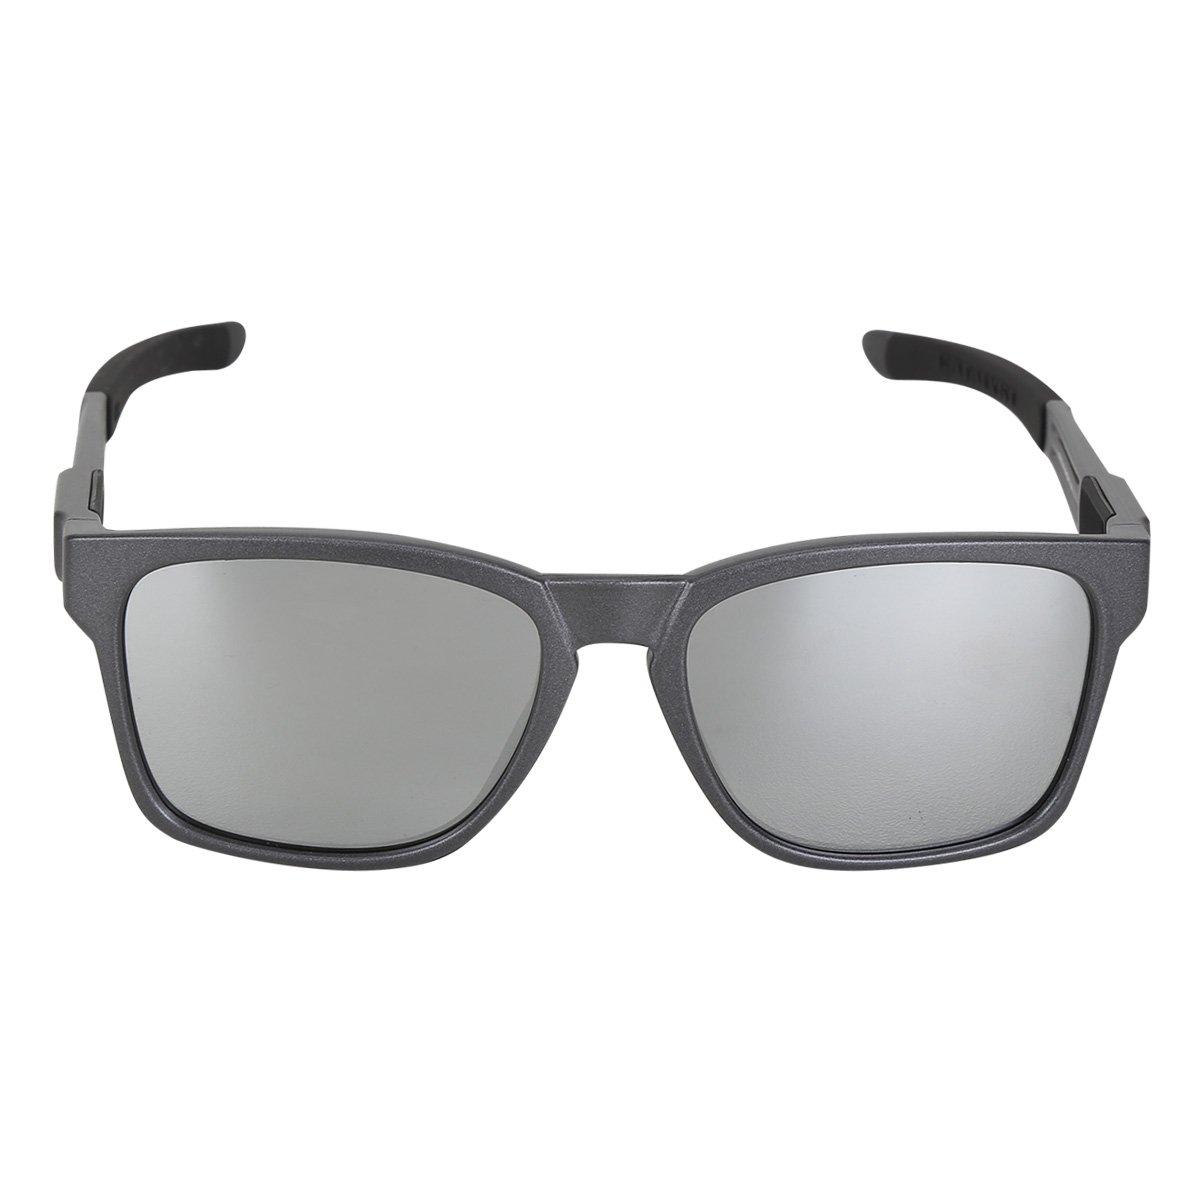 9c61a57702fca Óculos de Sol Oakley Catalyst Iridium Masculino - Compre Agora   Zattini